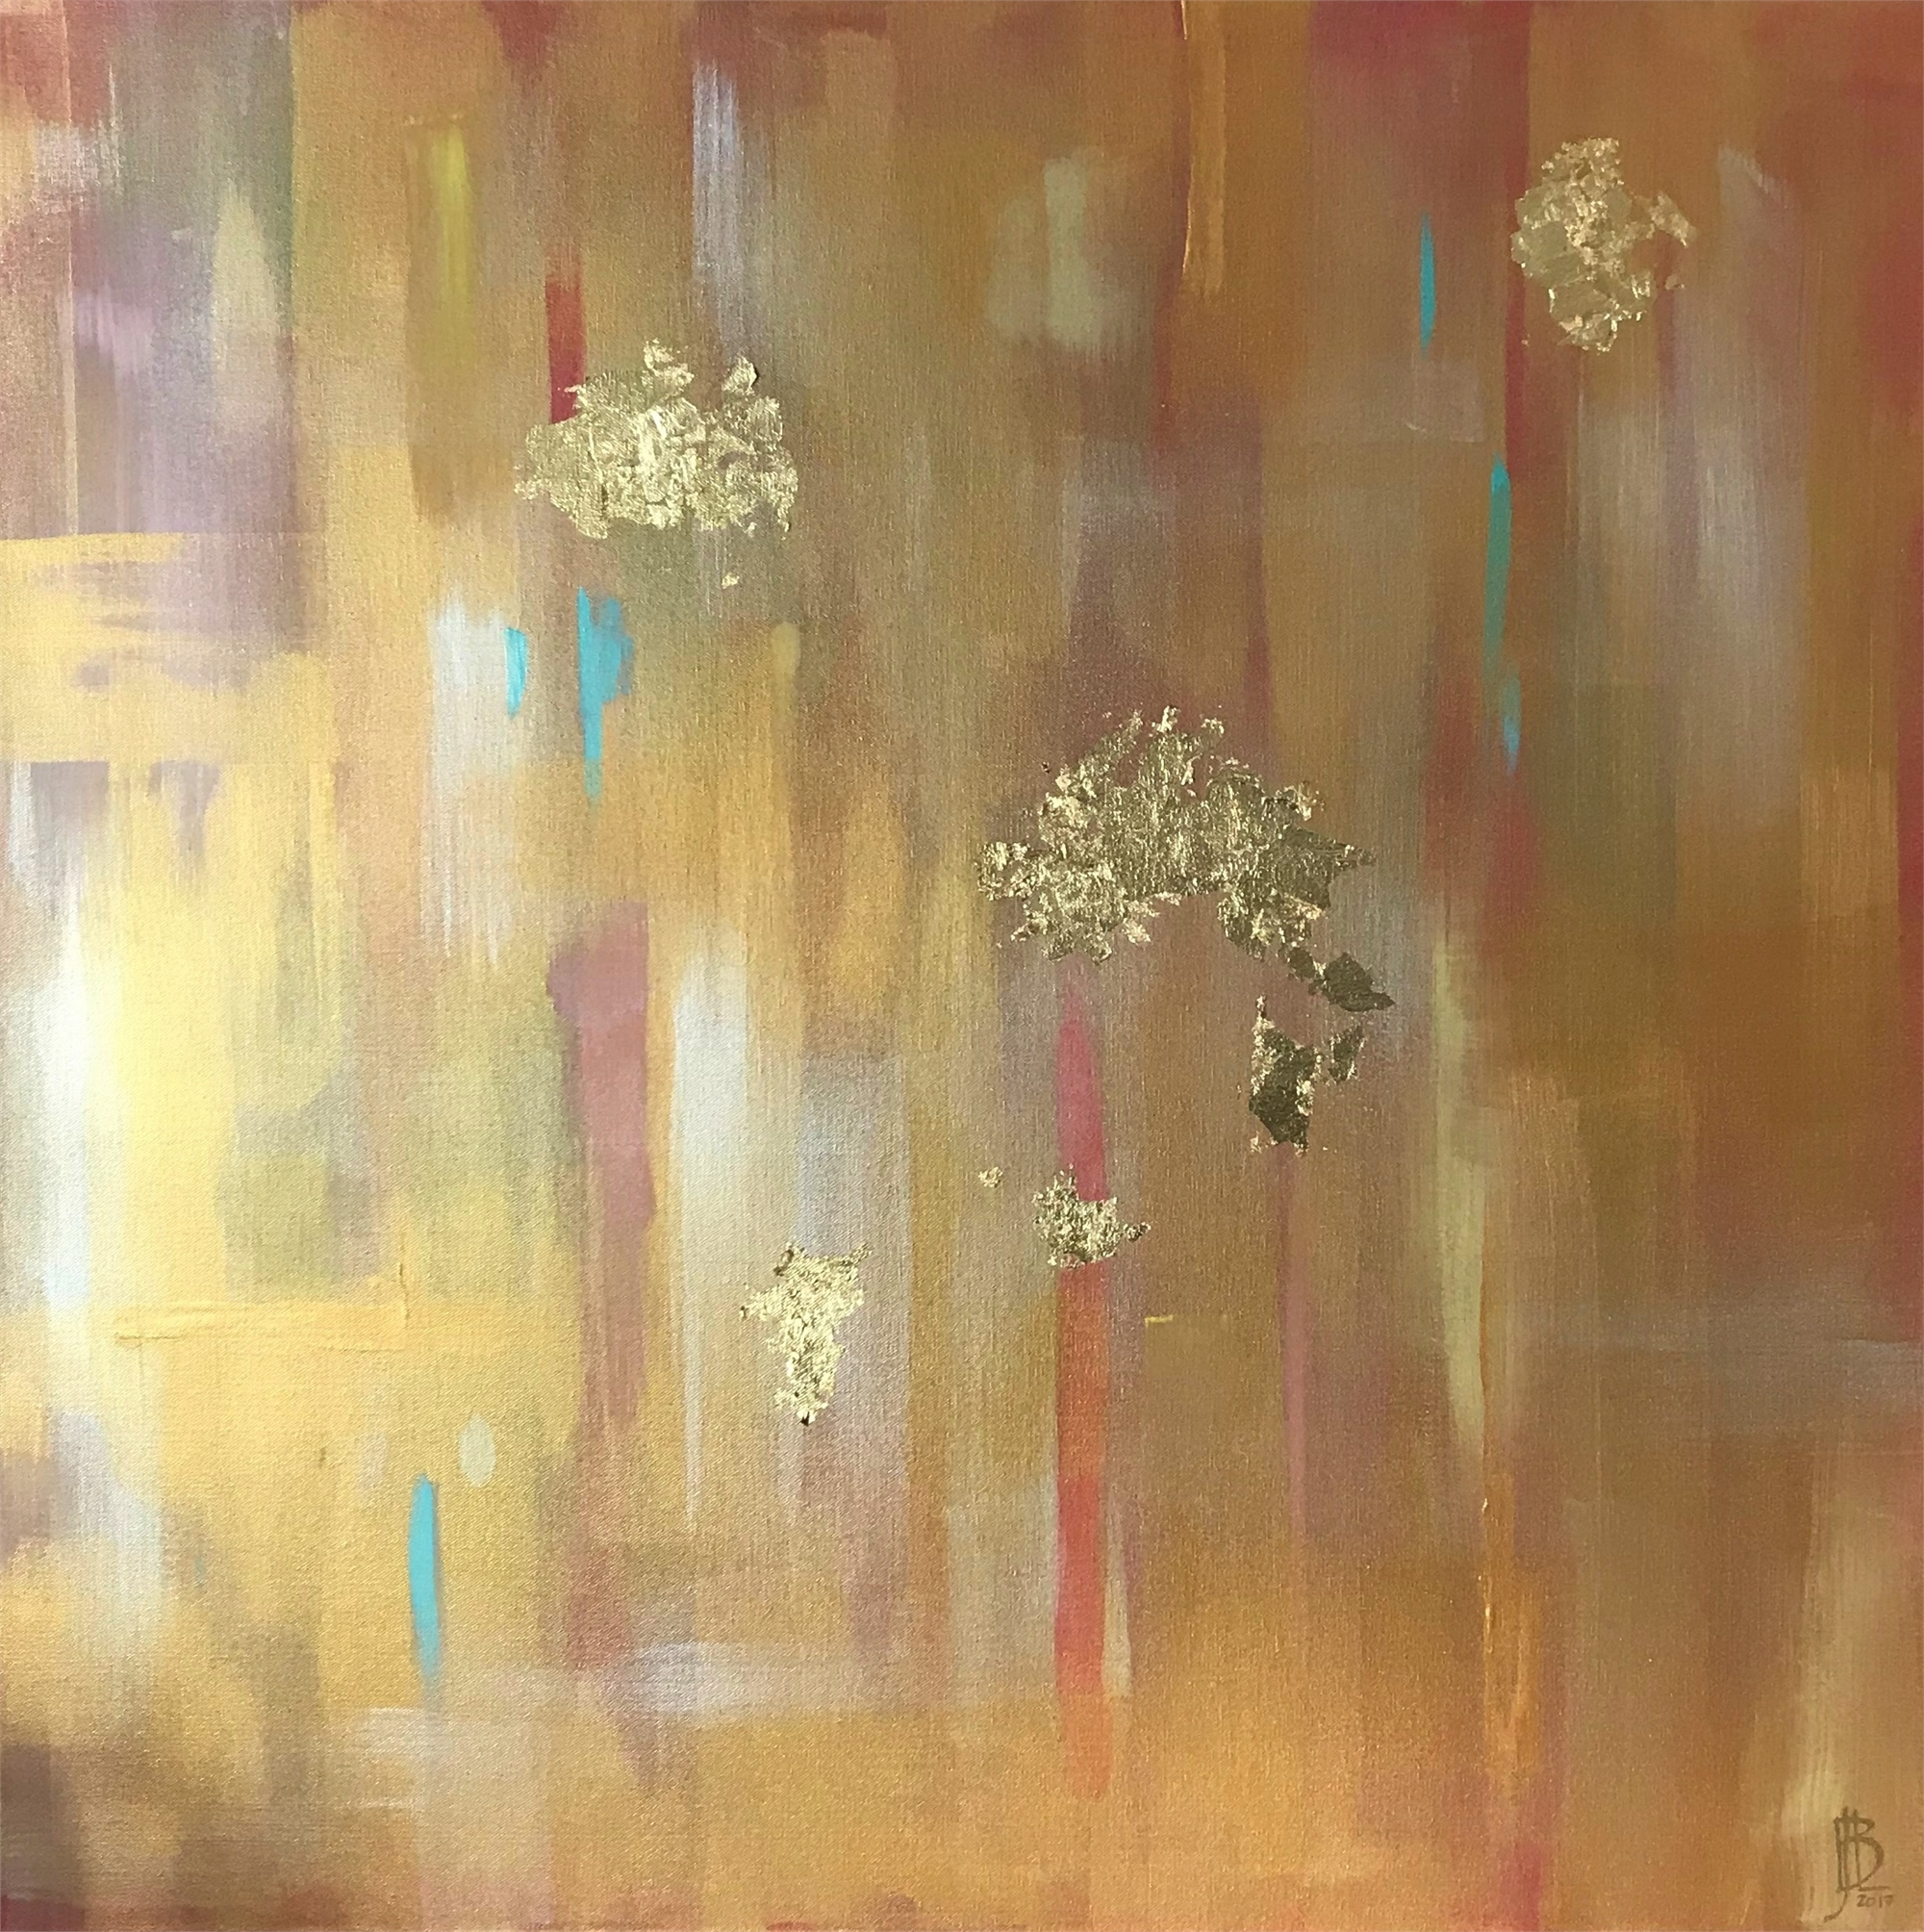 Beauty No. 14 by Leslie Poteet Busker